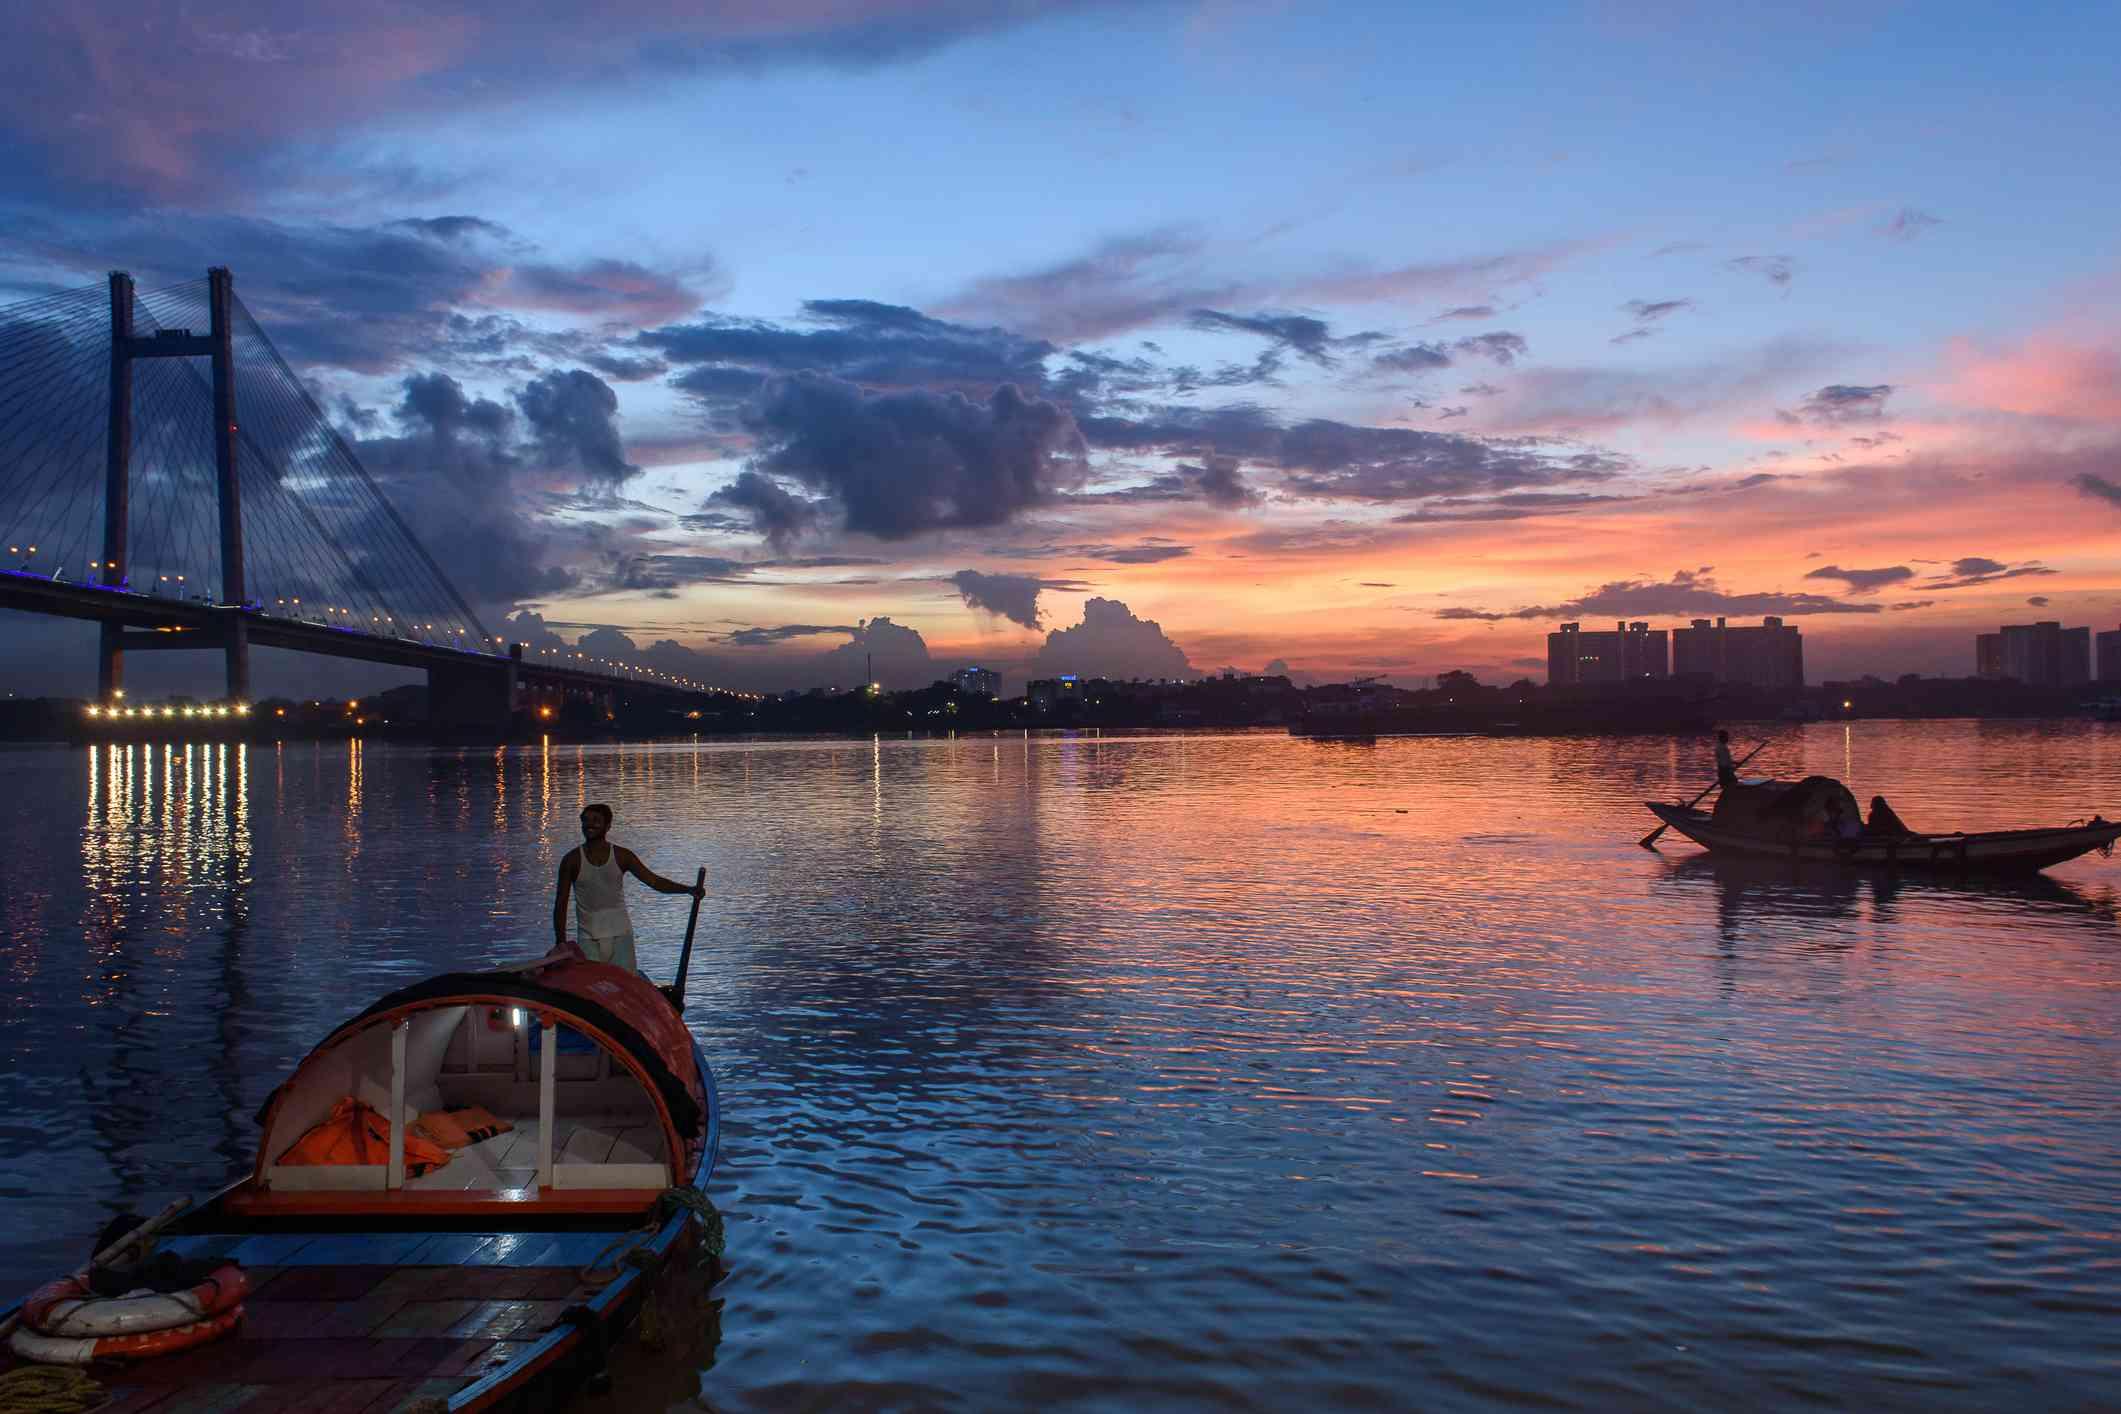 Silhouette of Vidyasagar Setu bridge at twilight with a wooden boat on Hoogly river.